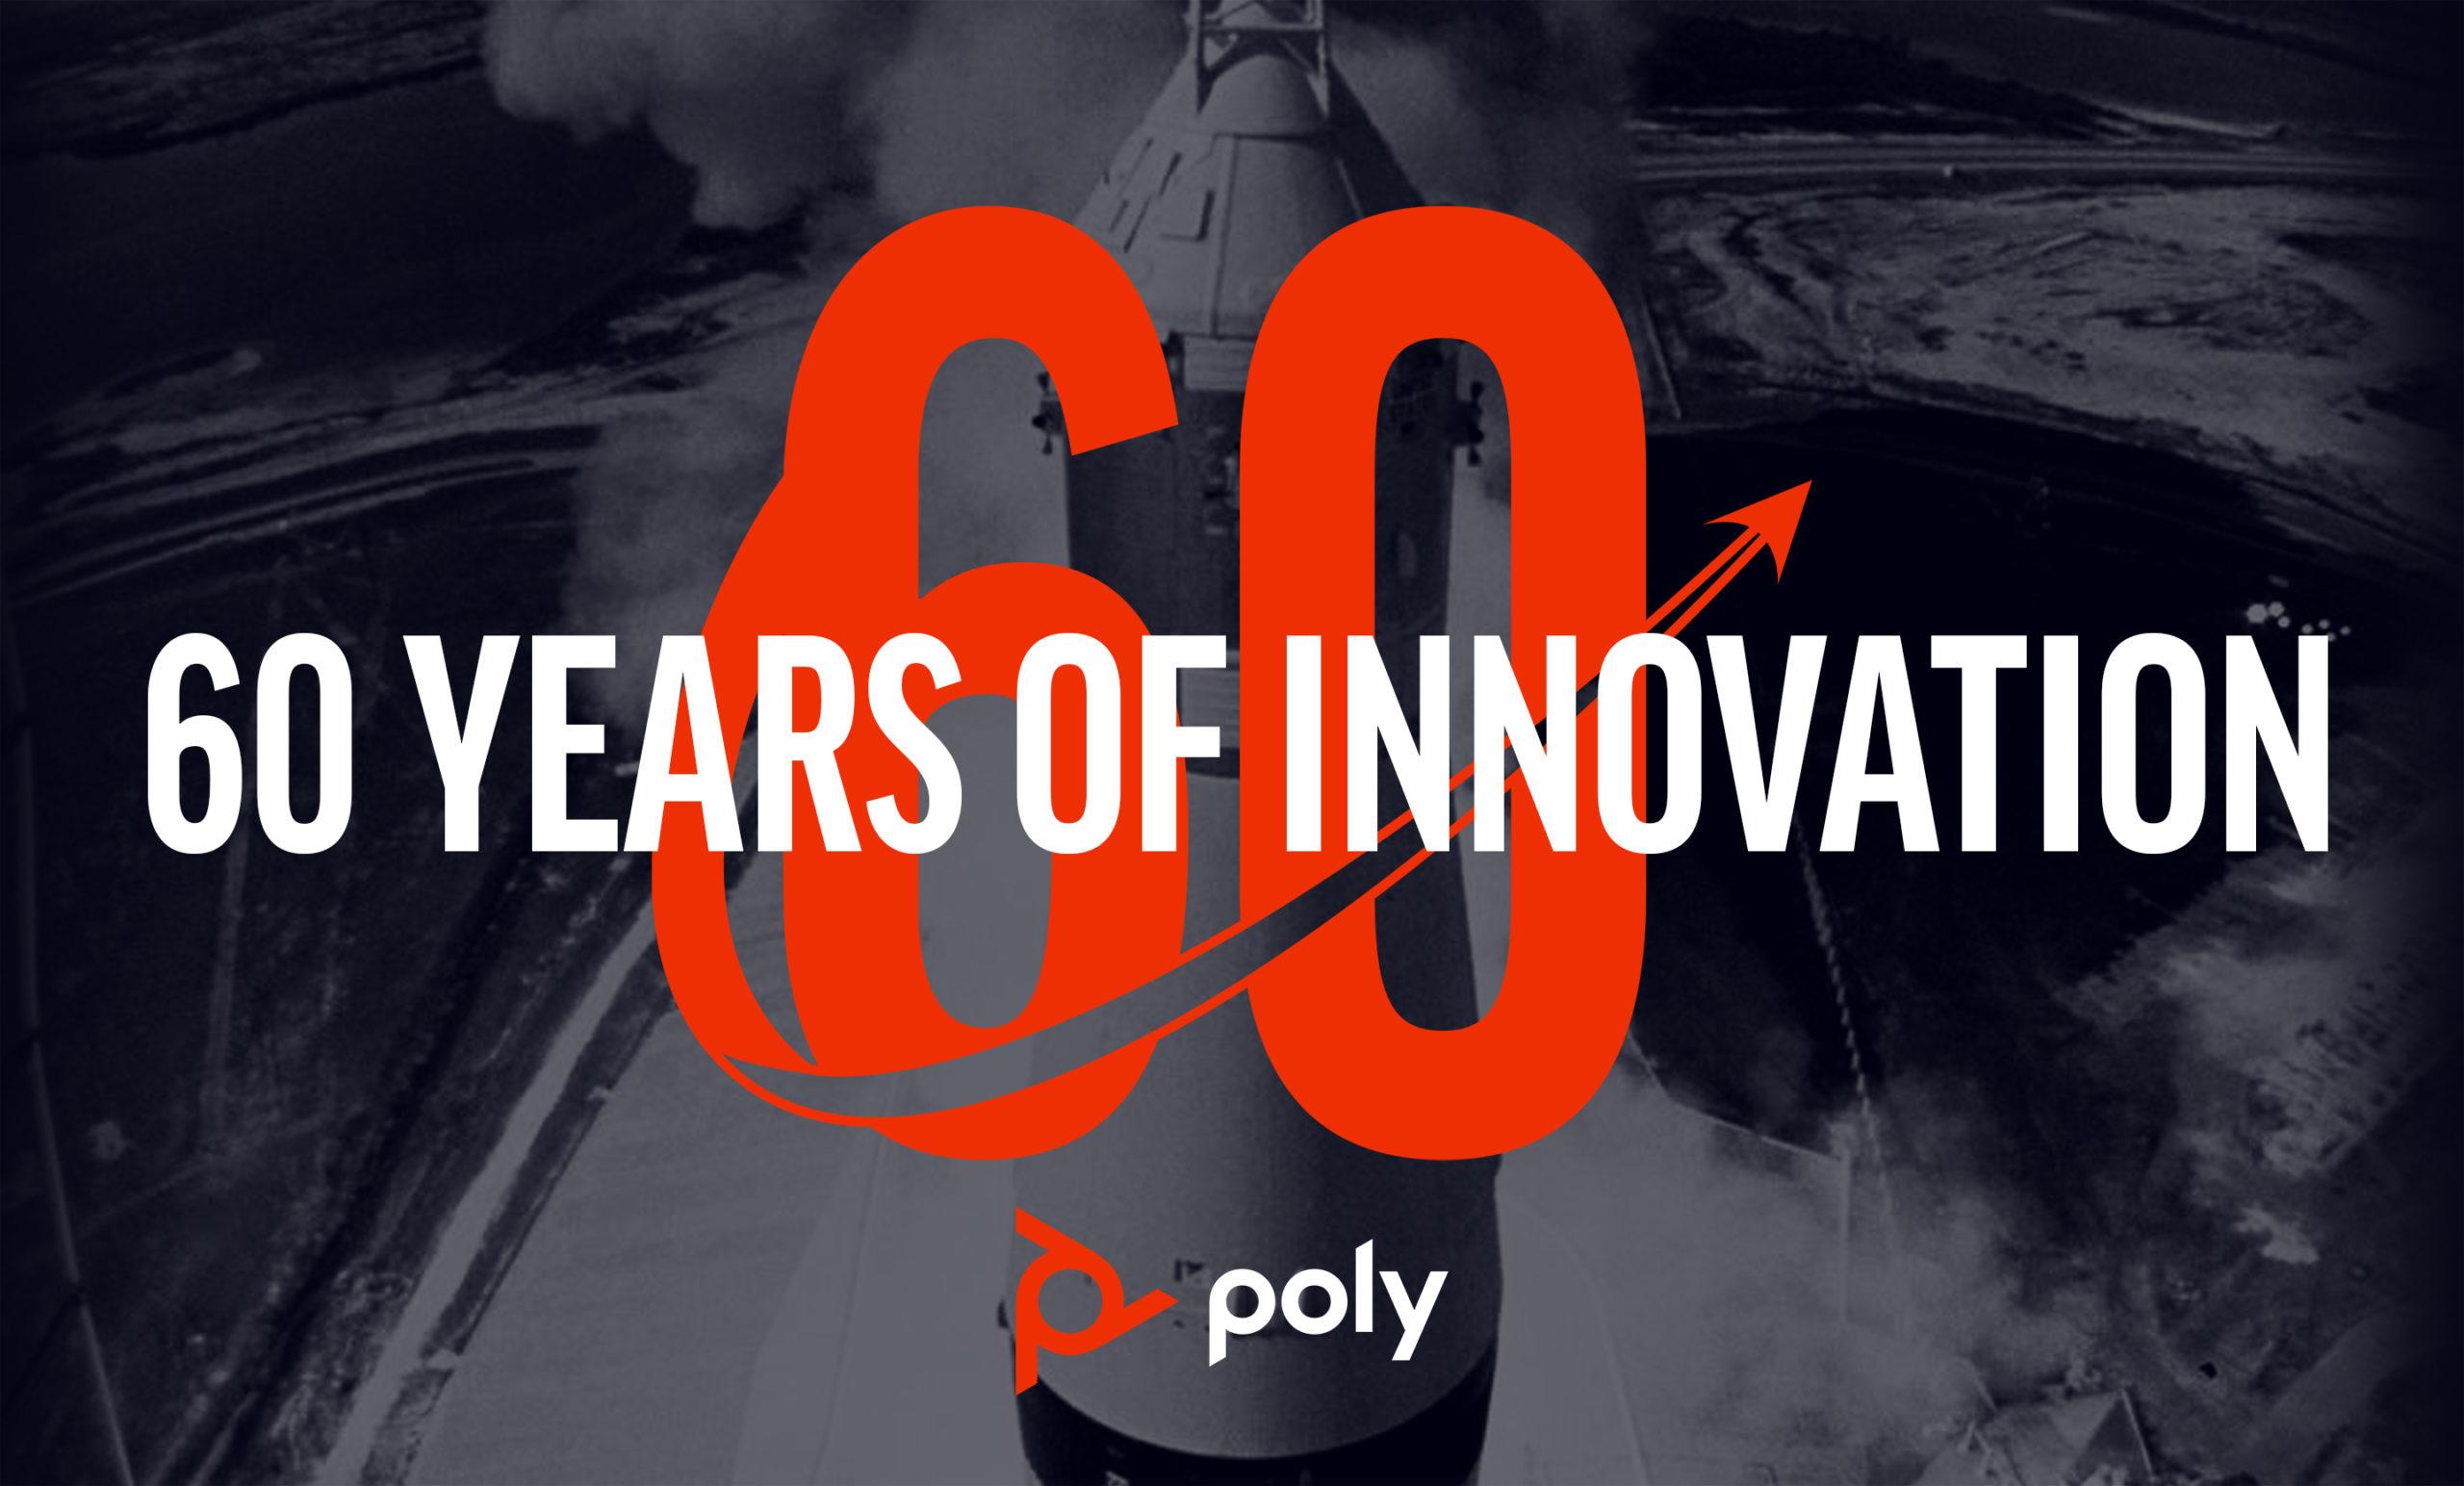 Celebrating 60 Years of Innovation